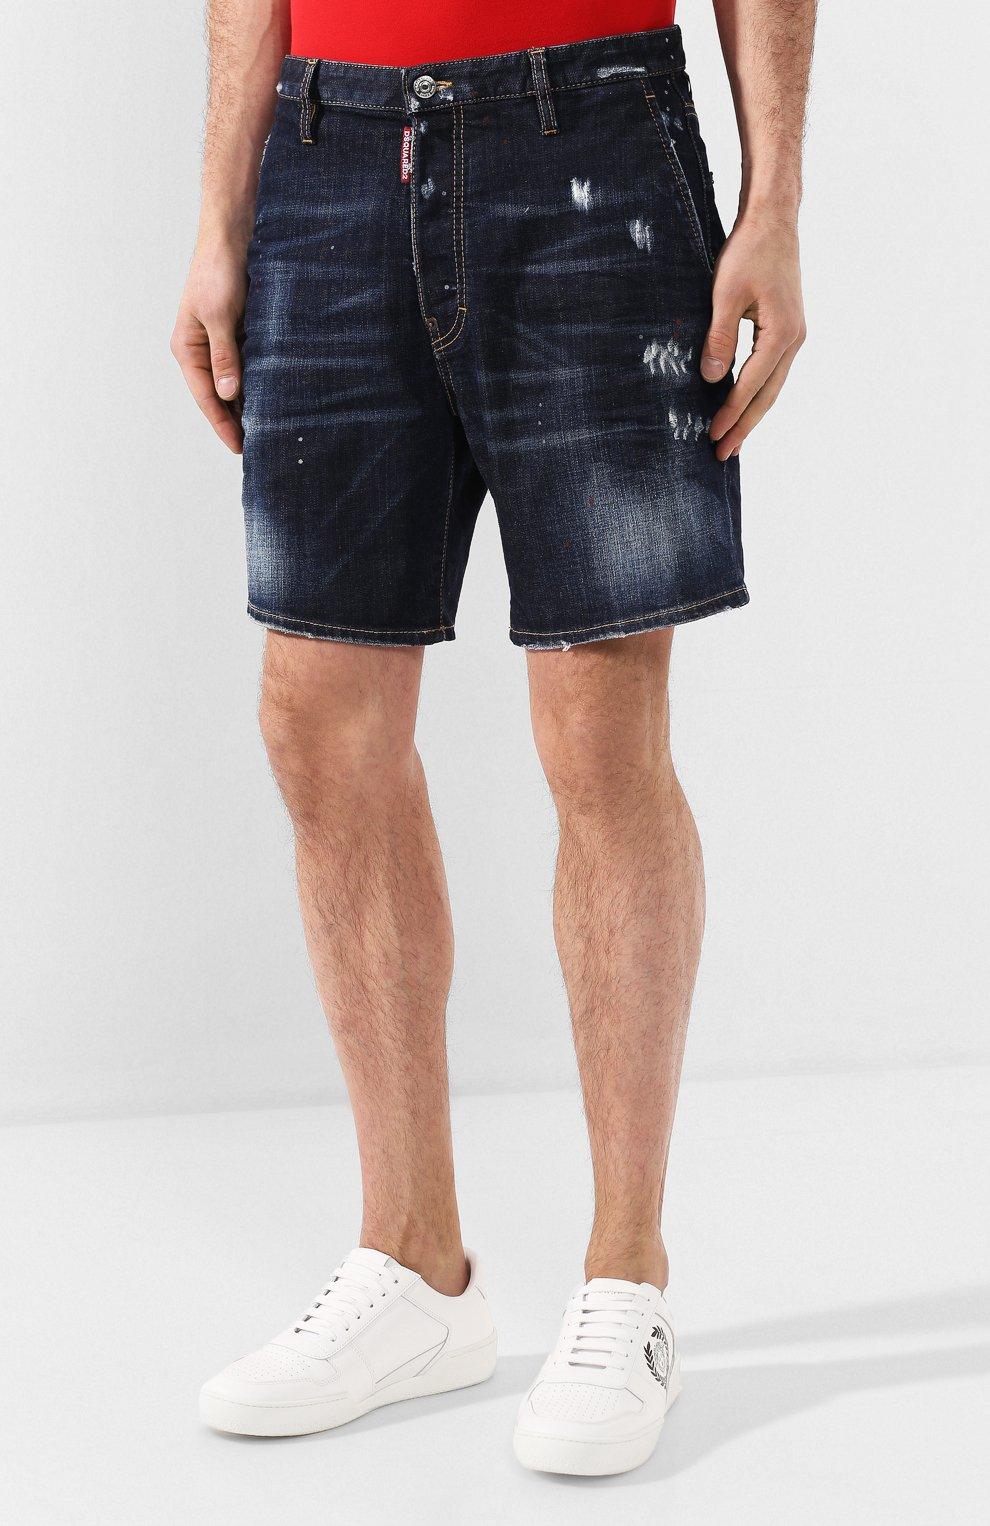 Мужские джинсовые шорты DSQUARED2 темно-синего цвета, арт. S74MU0576/S30664   Фото 3